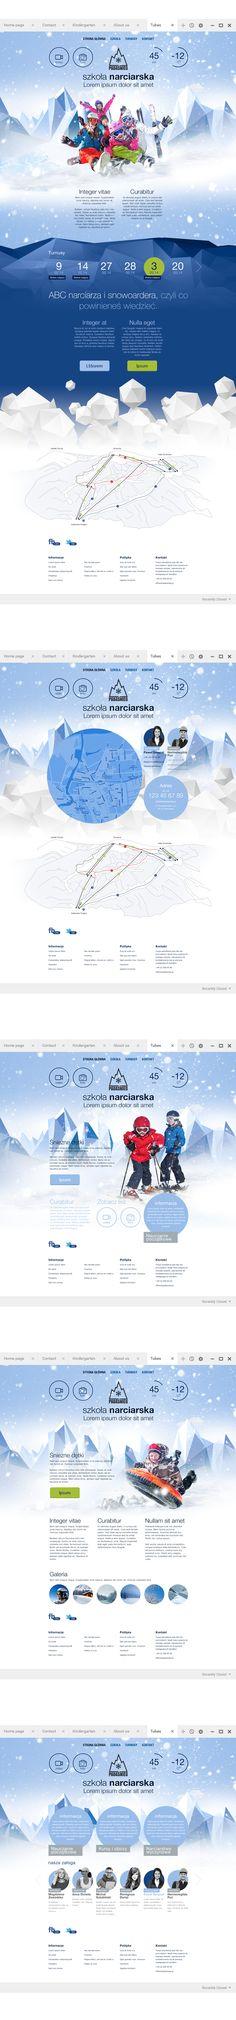 Padasnieg by Michal Galubinski. #webdesign #interactivedesign